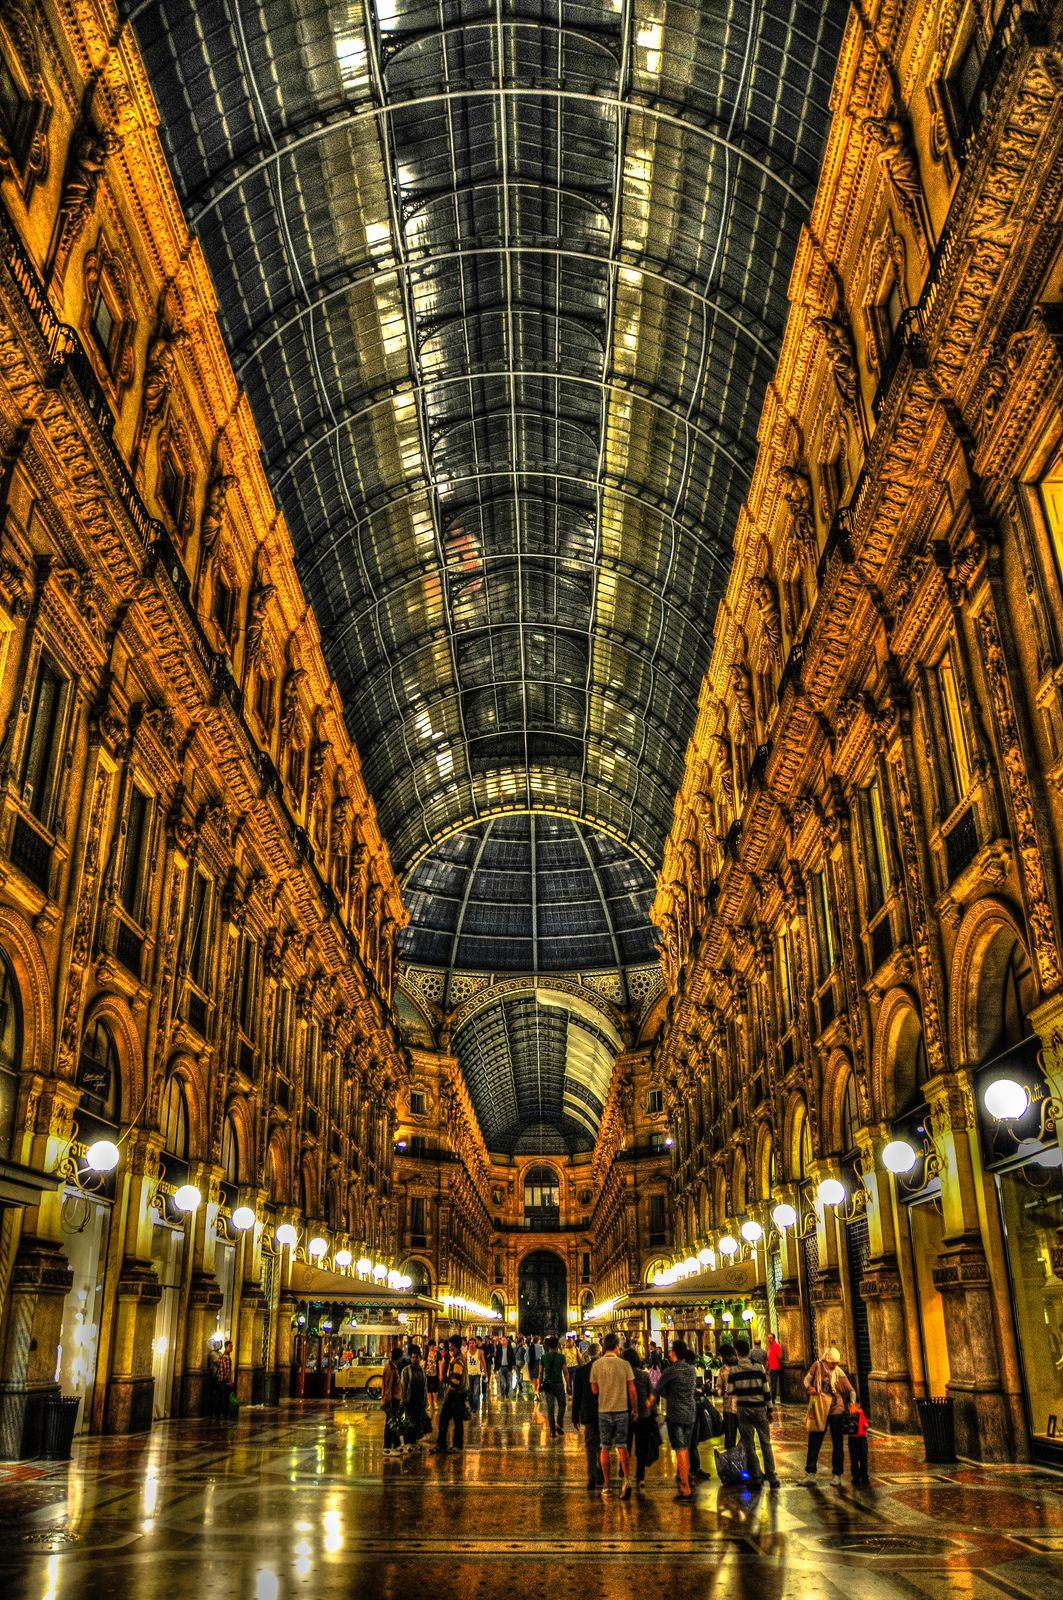 Galleria Vittorio Emanuele II, Milan. The world's oldest ...